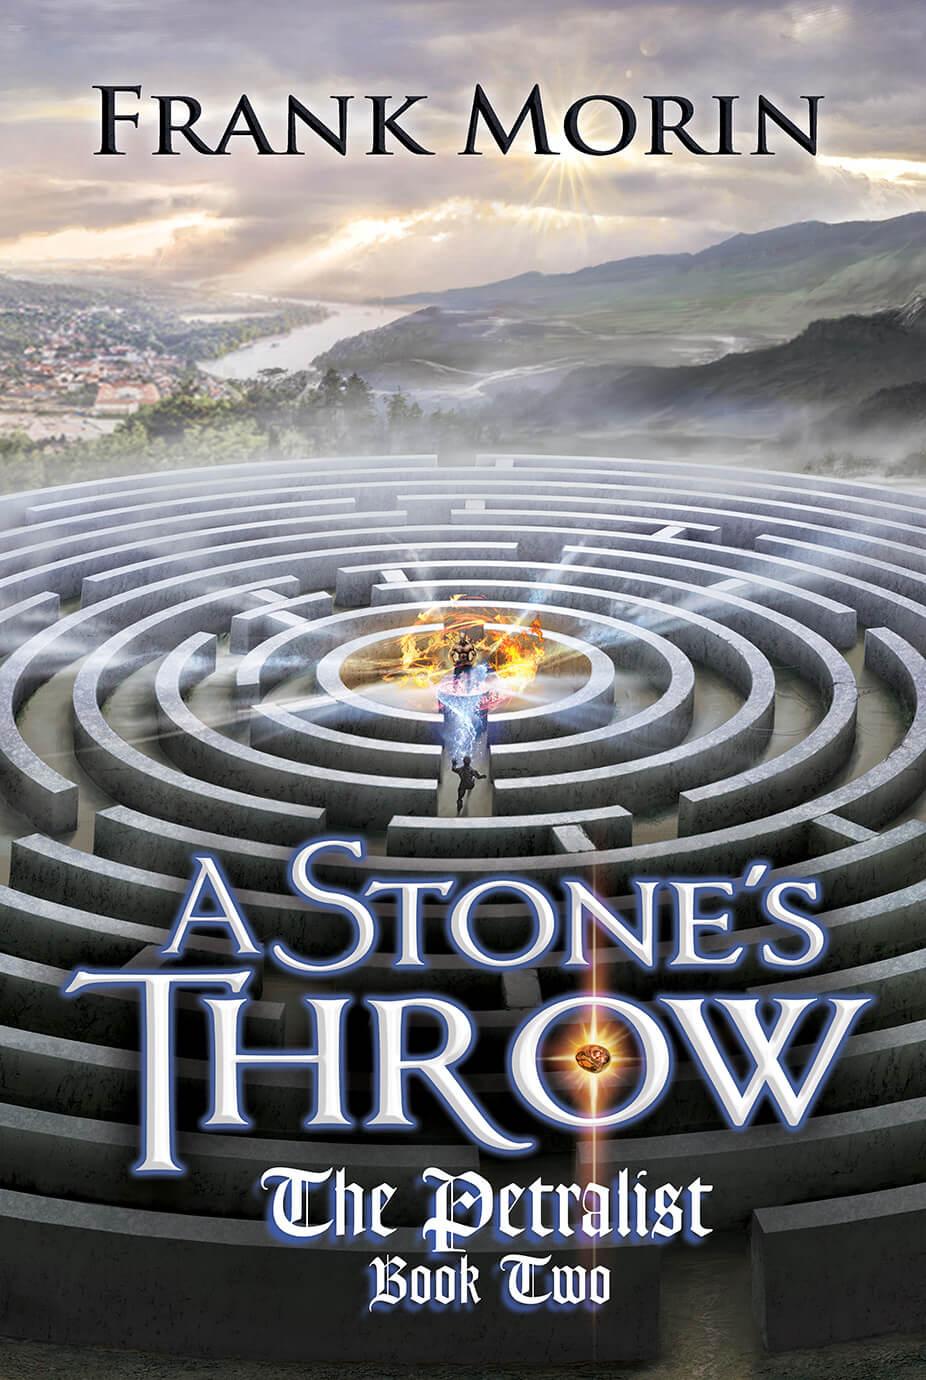 A Stone's Throw